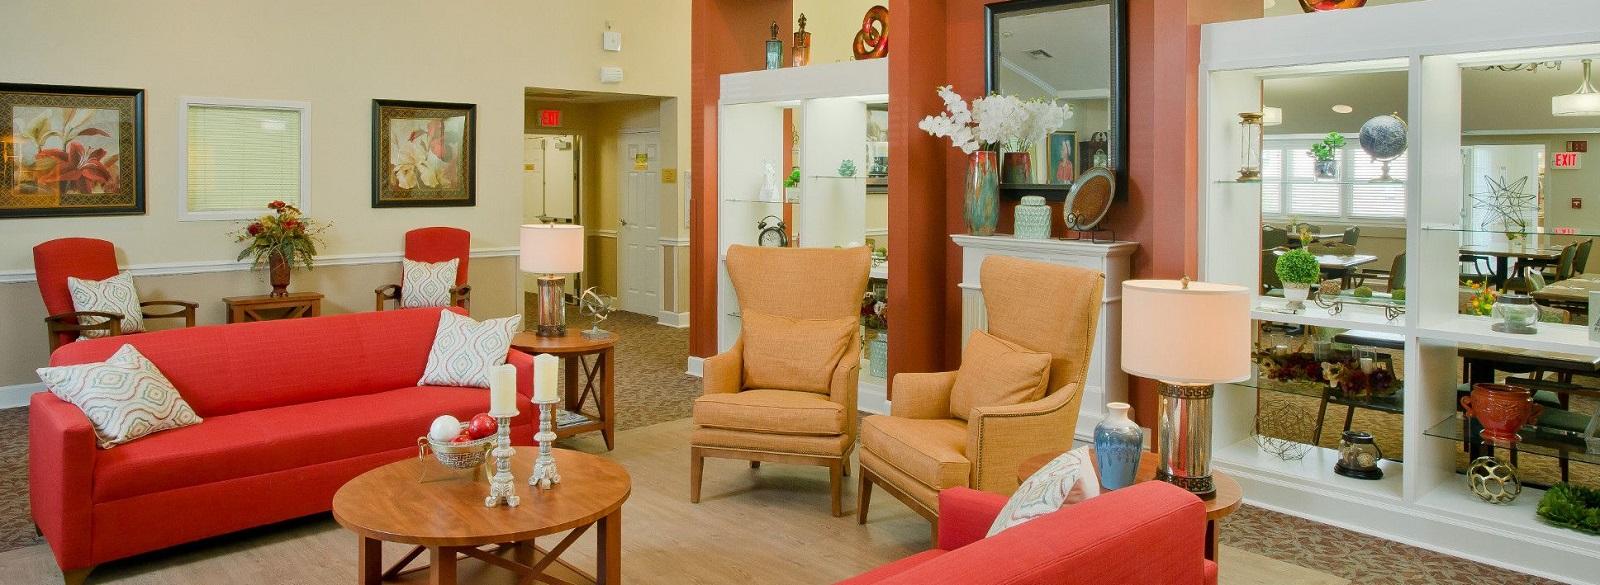 Asbury Kingsport Assisted Living Main Lobby